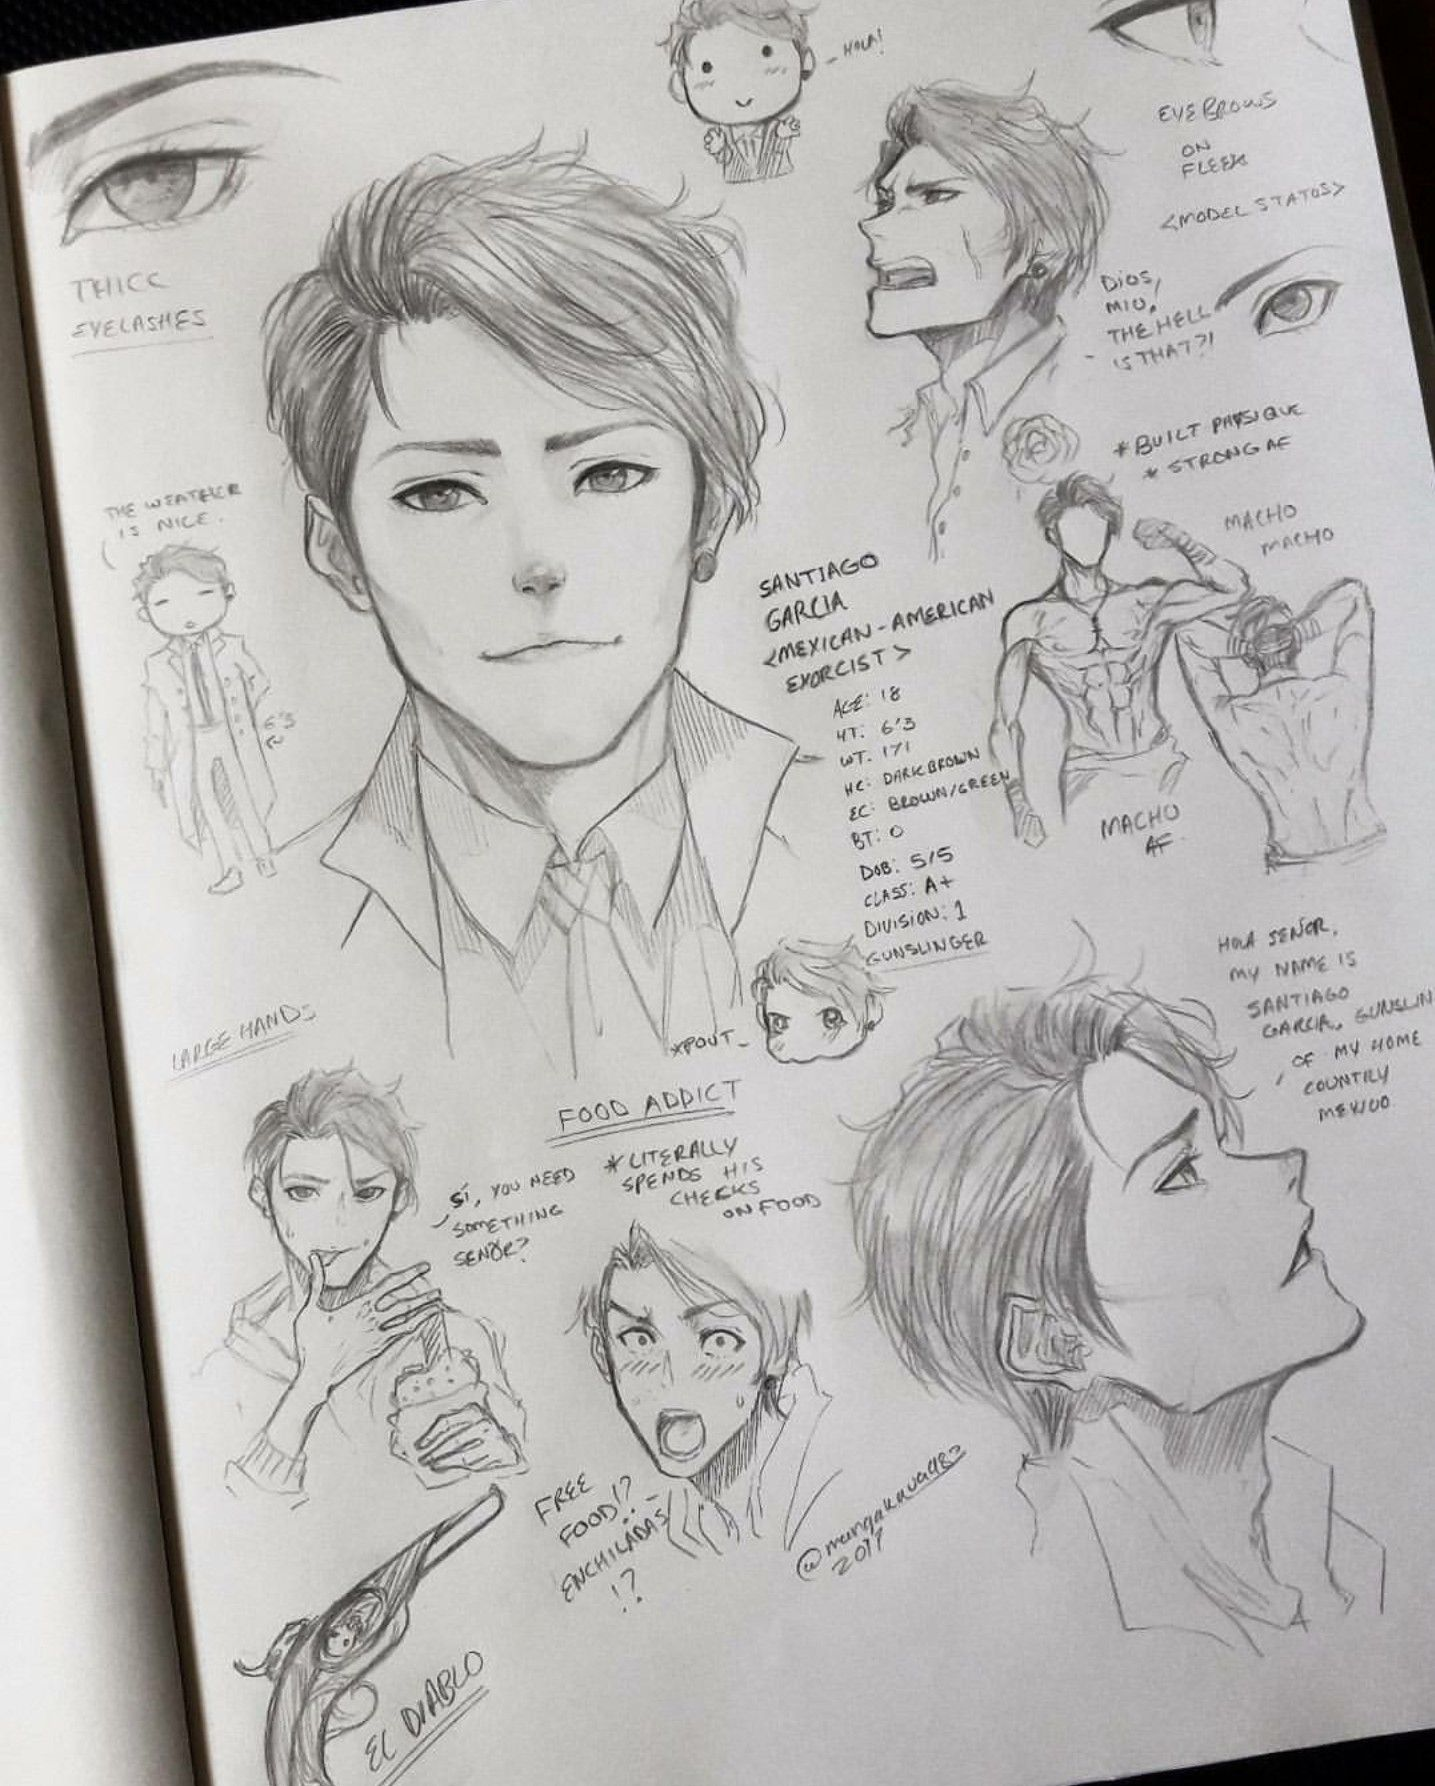 Creating A Male Character Artist Mangakaua983 Anime Sketch Art Sketches Illustration Character Design